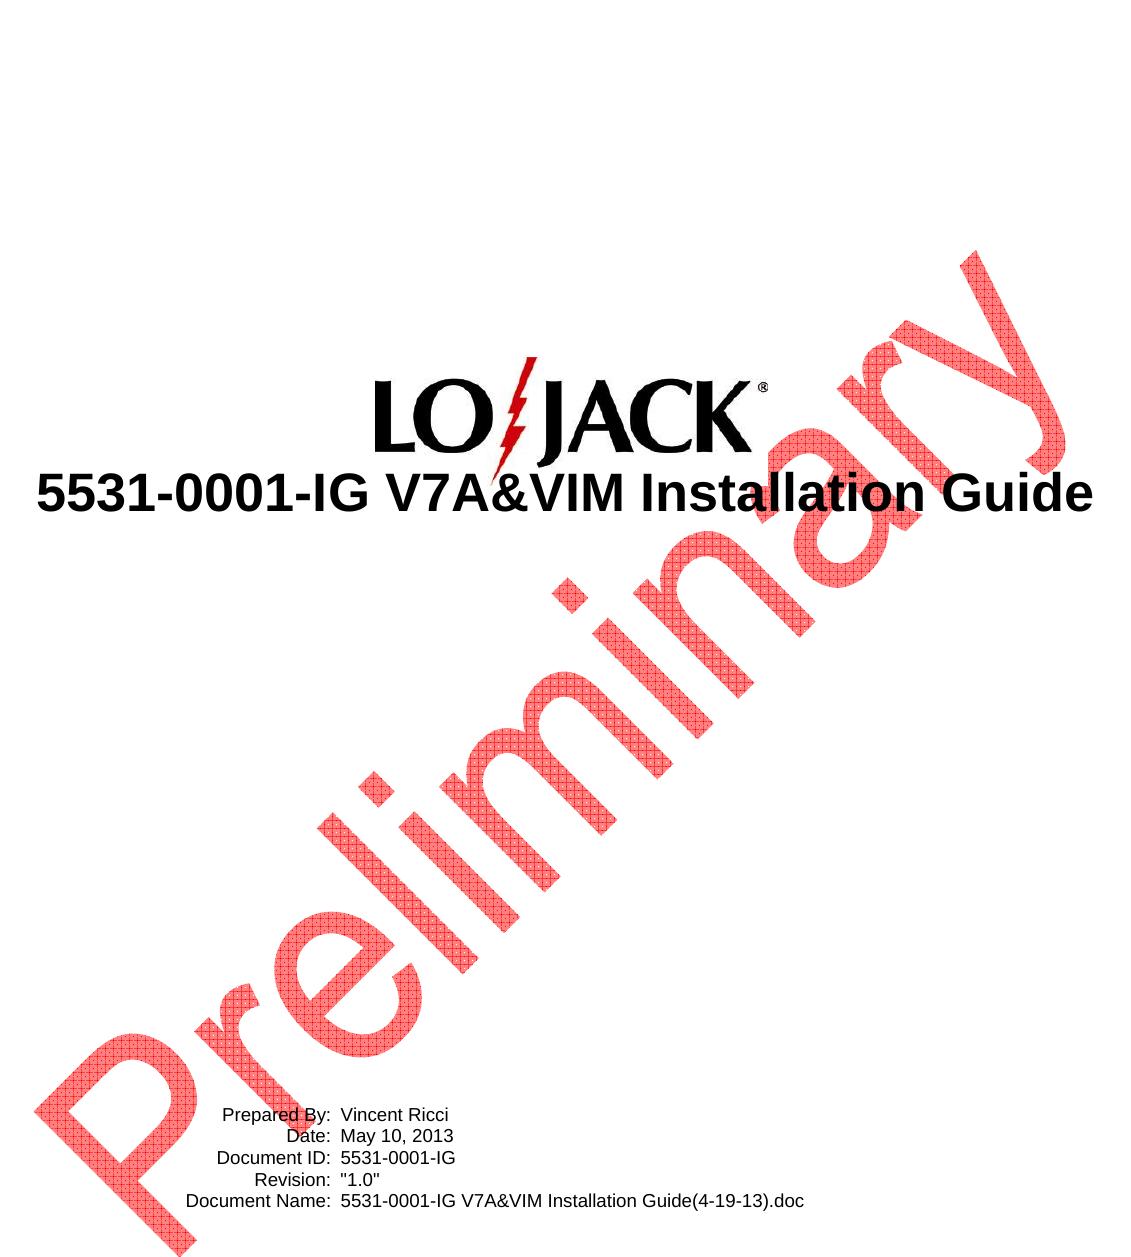 Strange Vim Vehicle Recovery Transceiver V7A User Manual Lojack Wiring Cloud Eachirenstrafr09Org